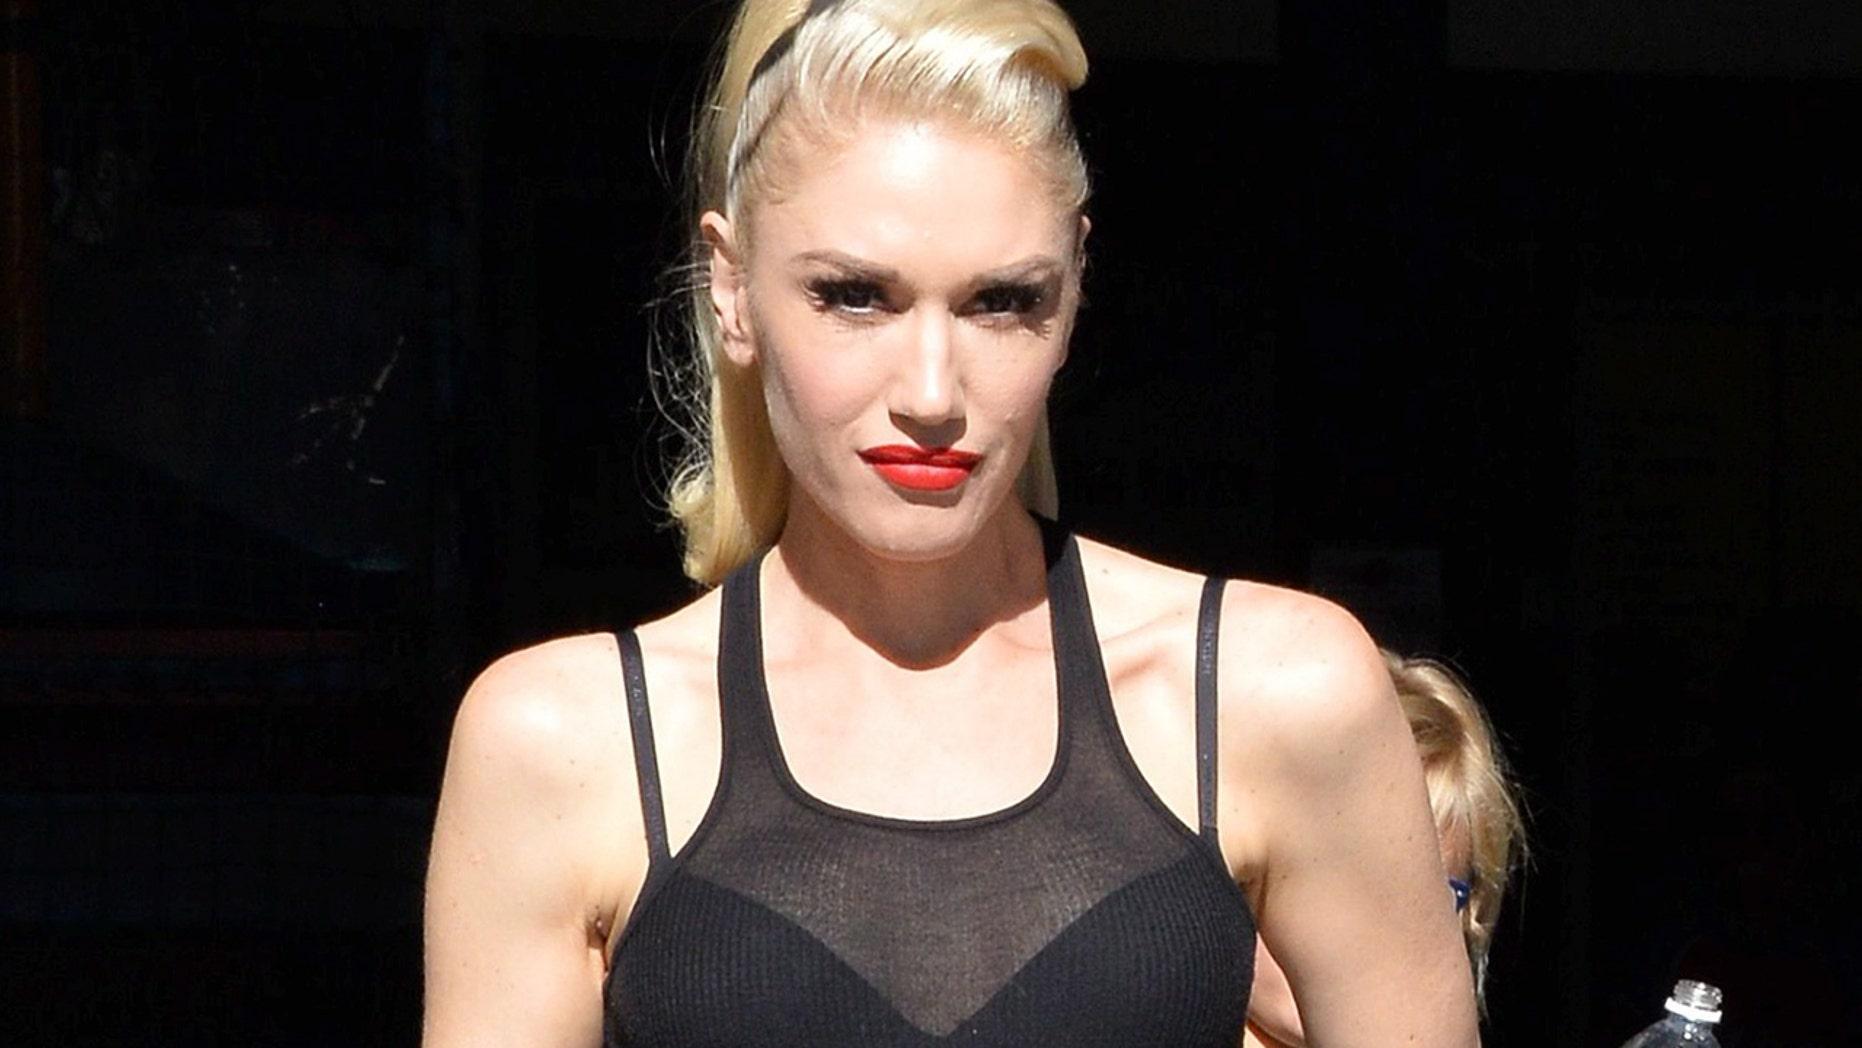 Gwen Stefani is Michael Moor's latest Trump theory.